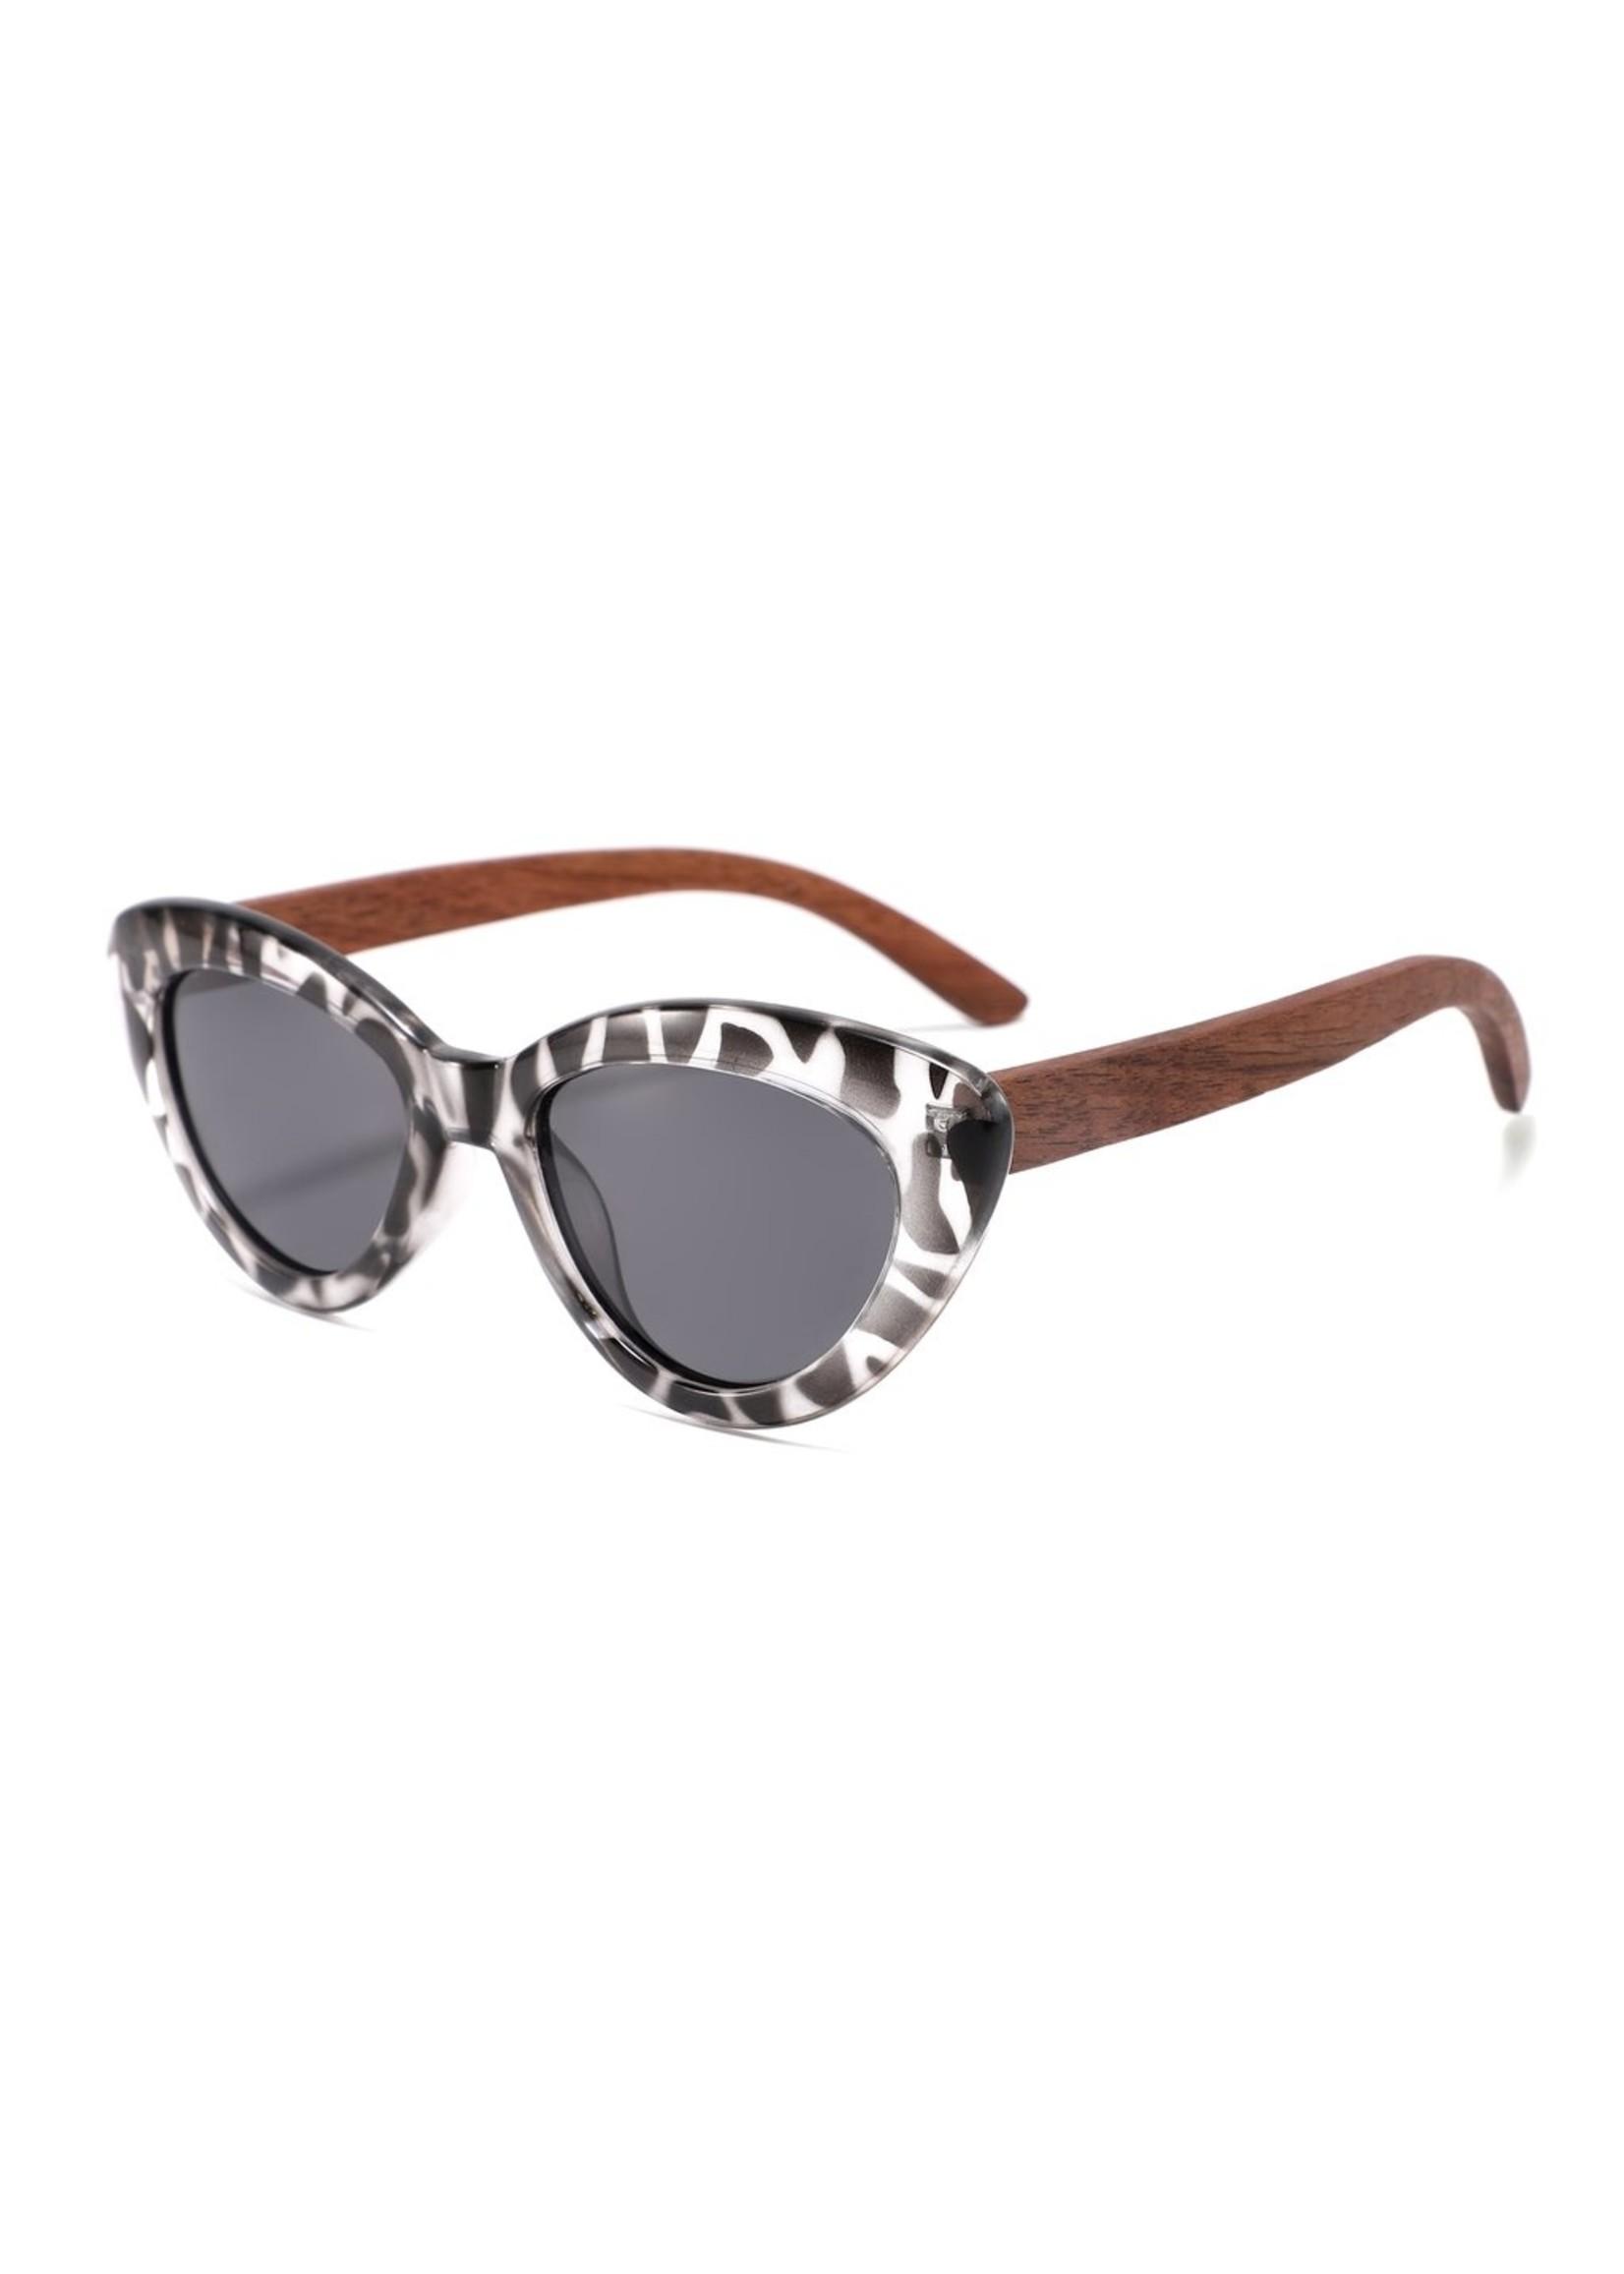 Kuma Sunglasses Paris - Black Tortoise